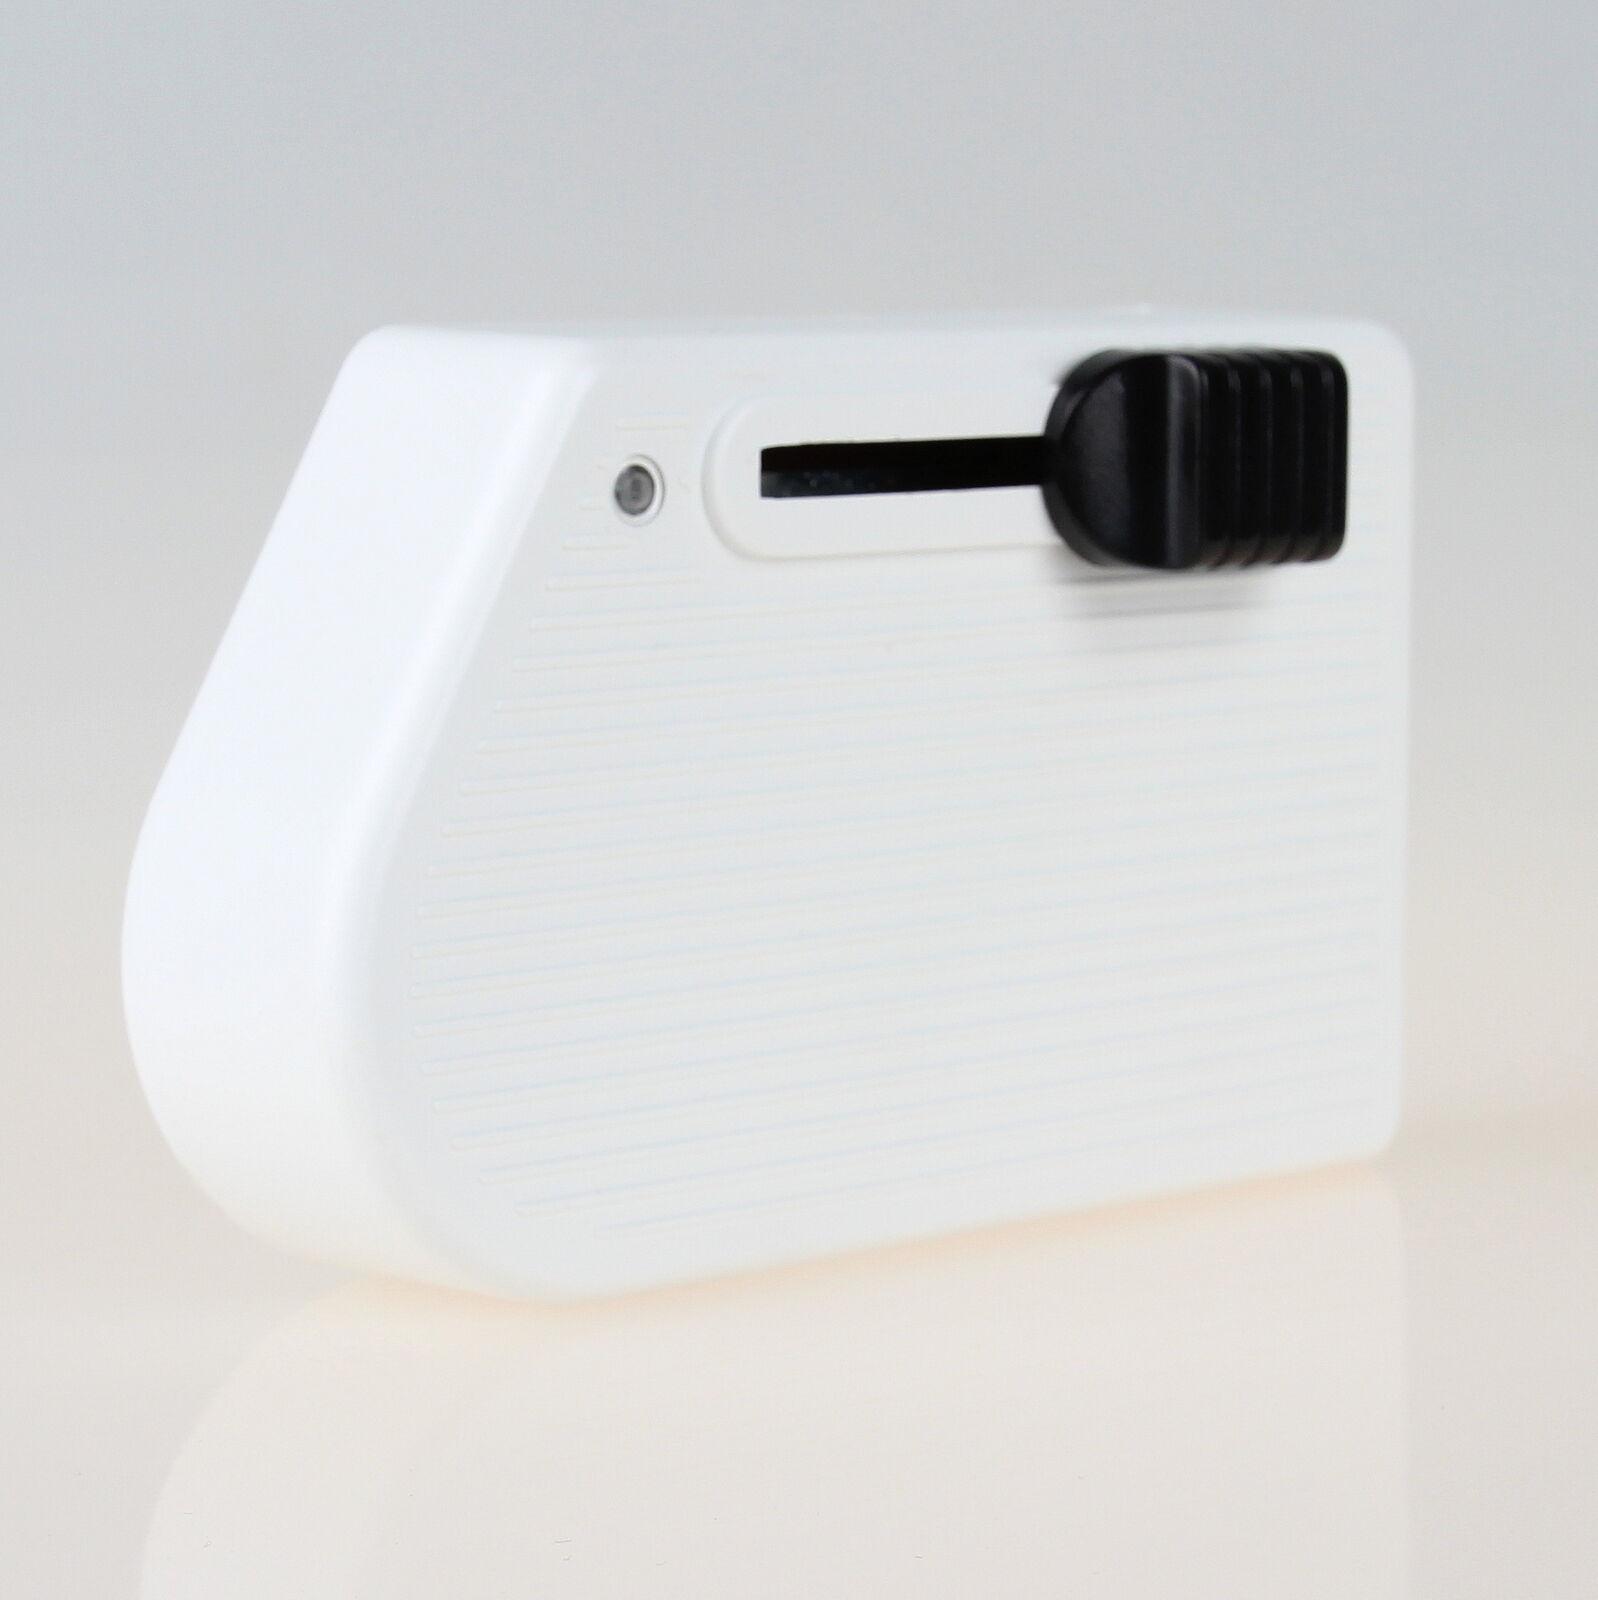 Schnur-Fußdimmer weiß 230V40-250W, HV-LED 4-100W Relco RT81 LED | Guter Markt